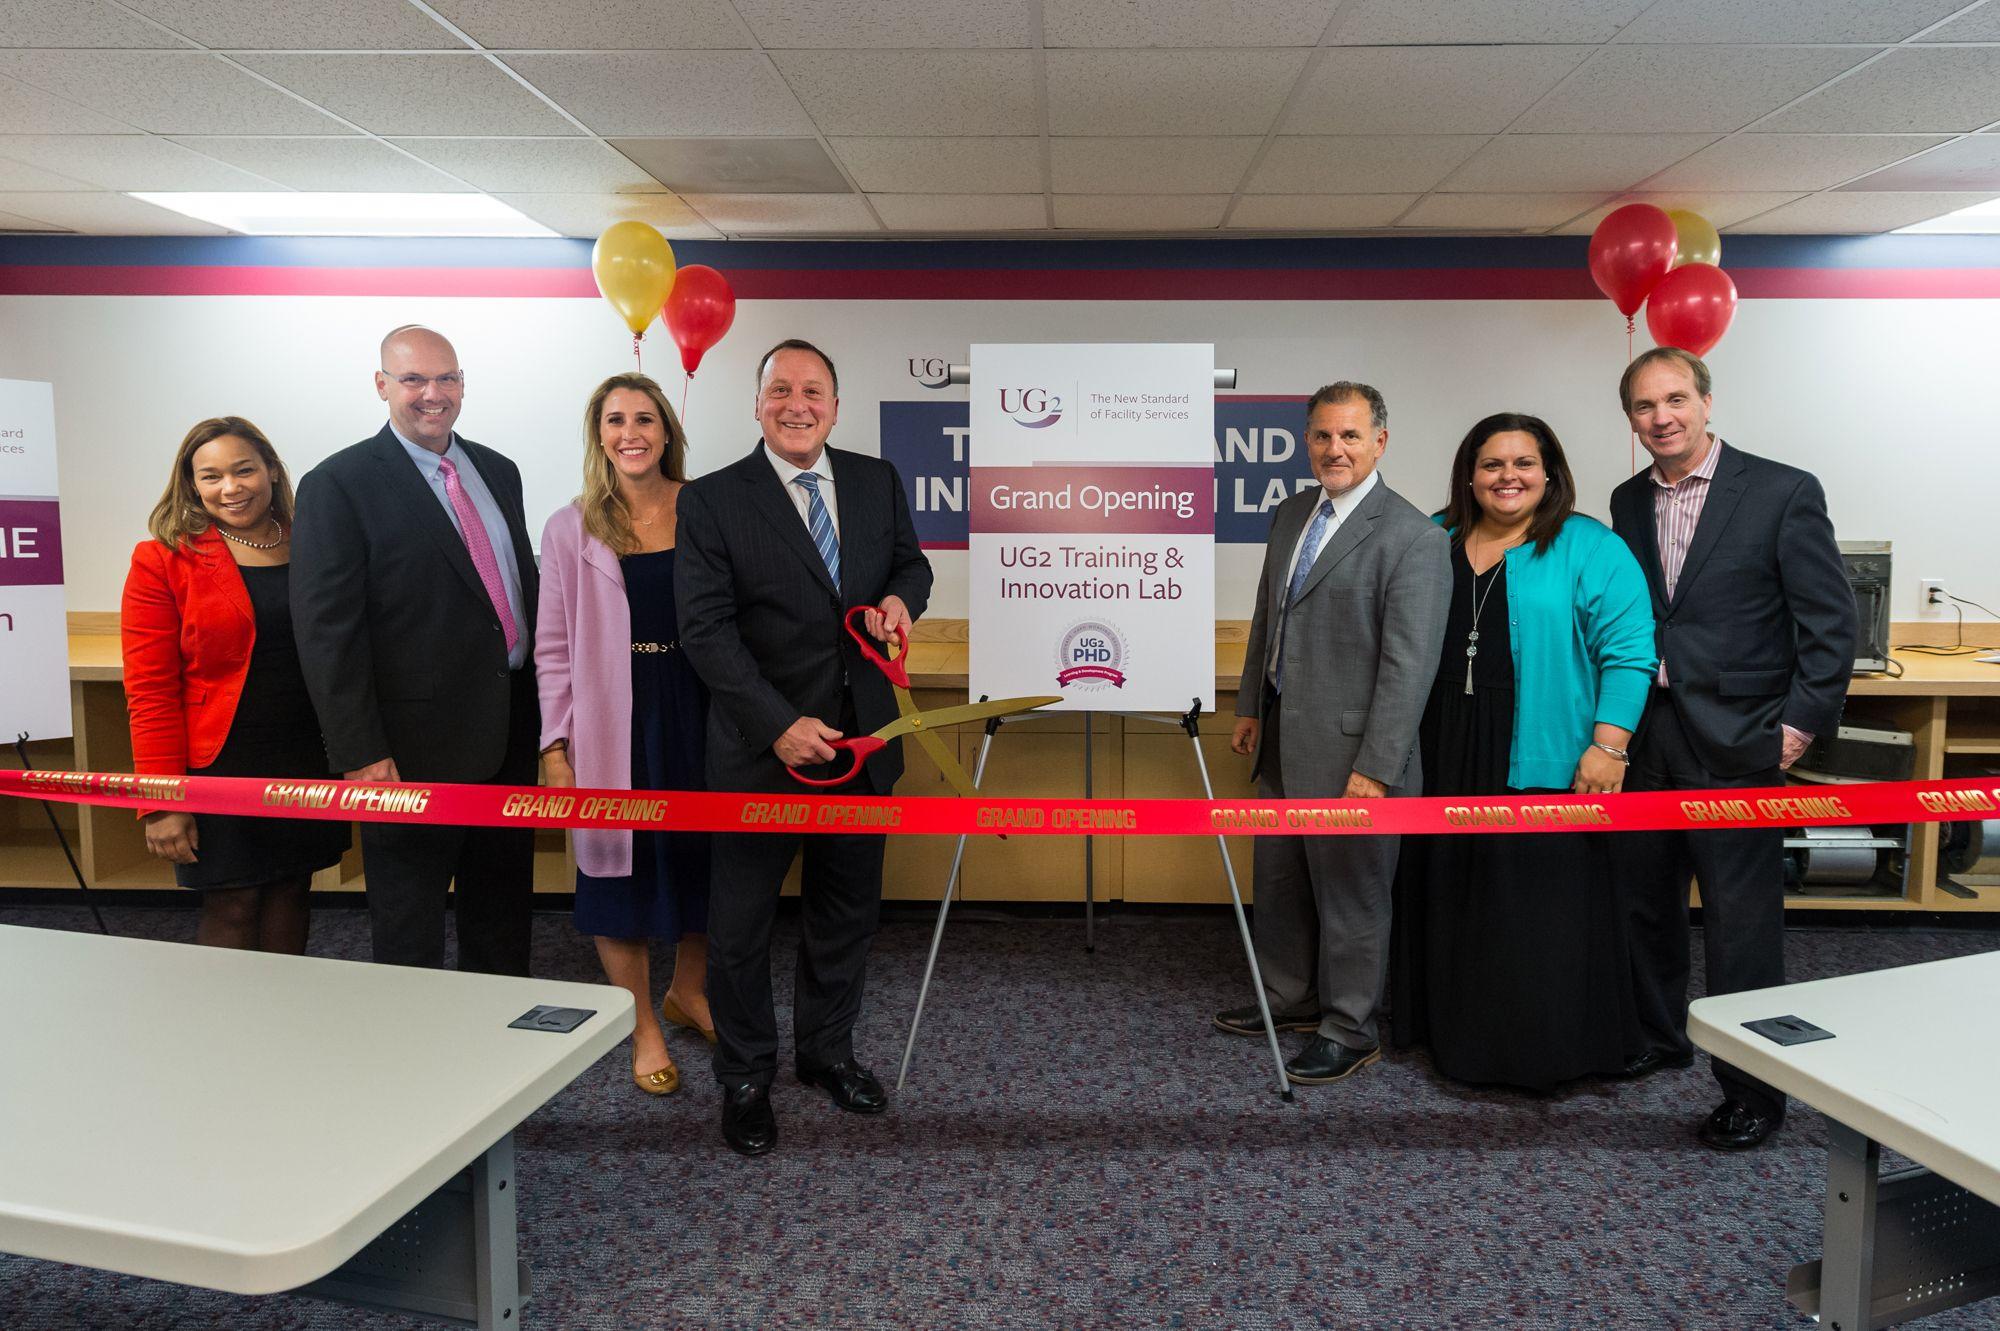 UG2 Senior Leadership cuts the ribbon at its new Innovation & Training Lab